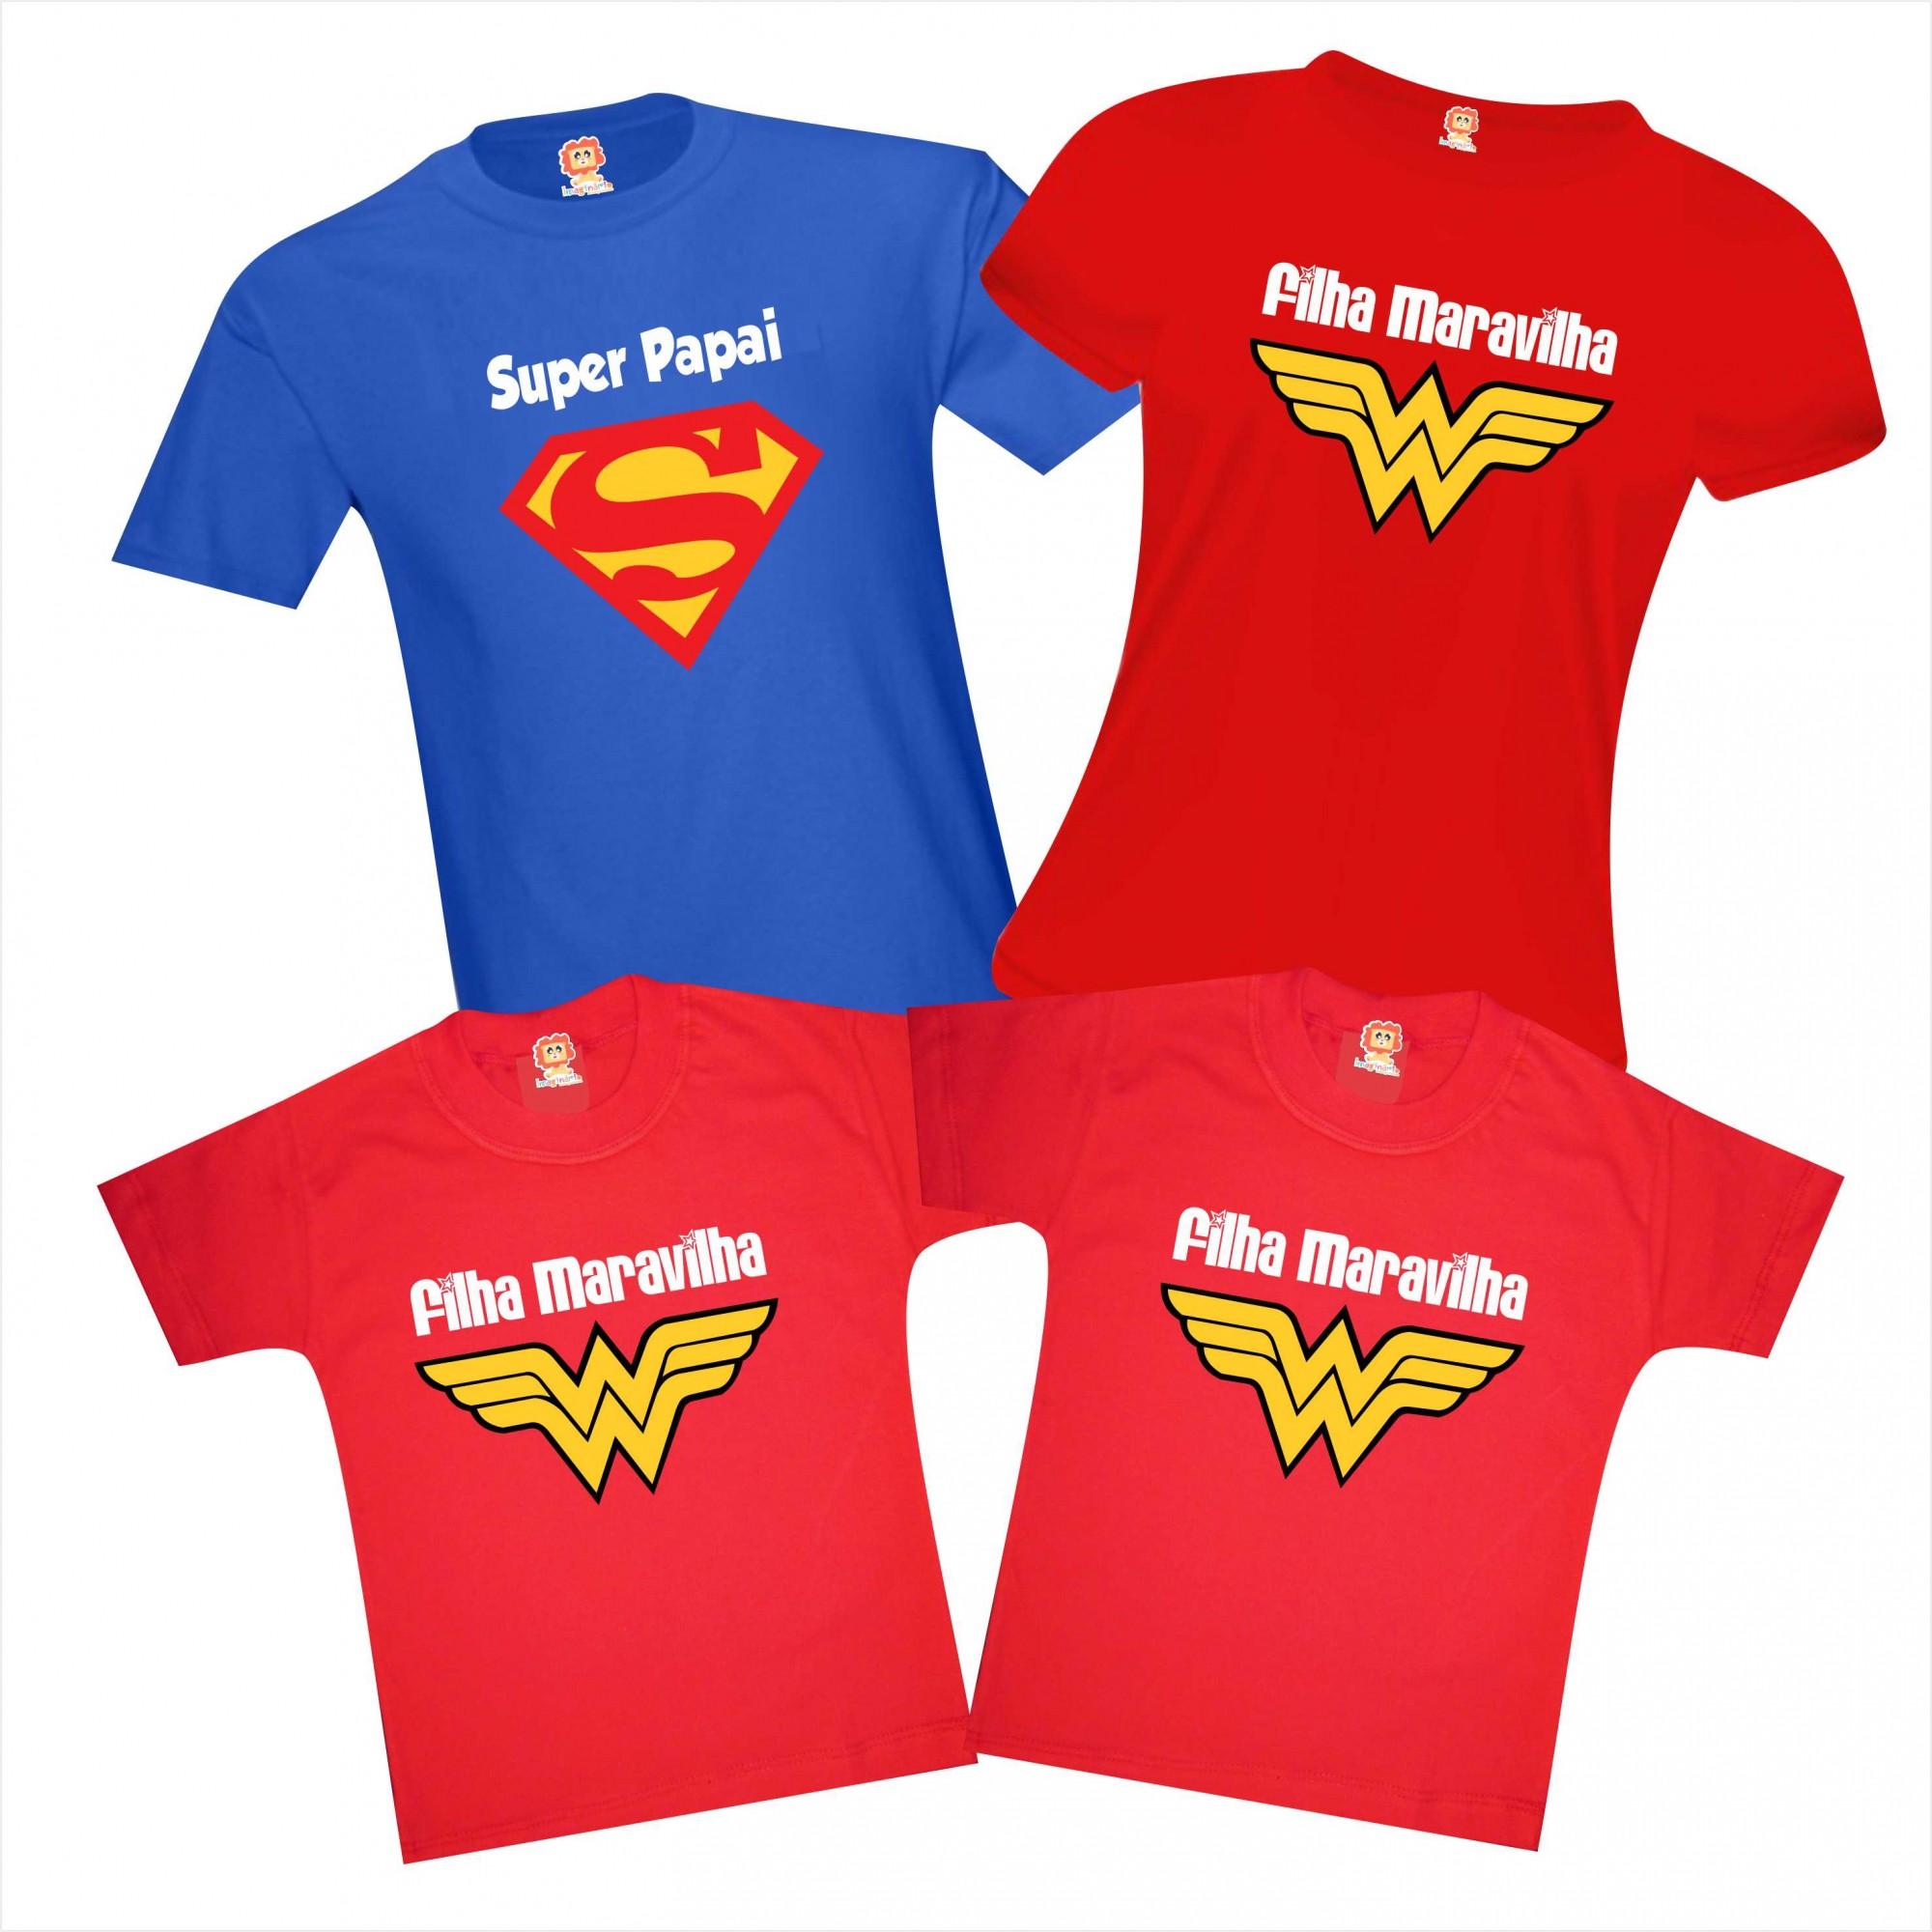 Kit Camisetas Super Papai e 3 Filhas Maravilhas Dia dos Pais